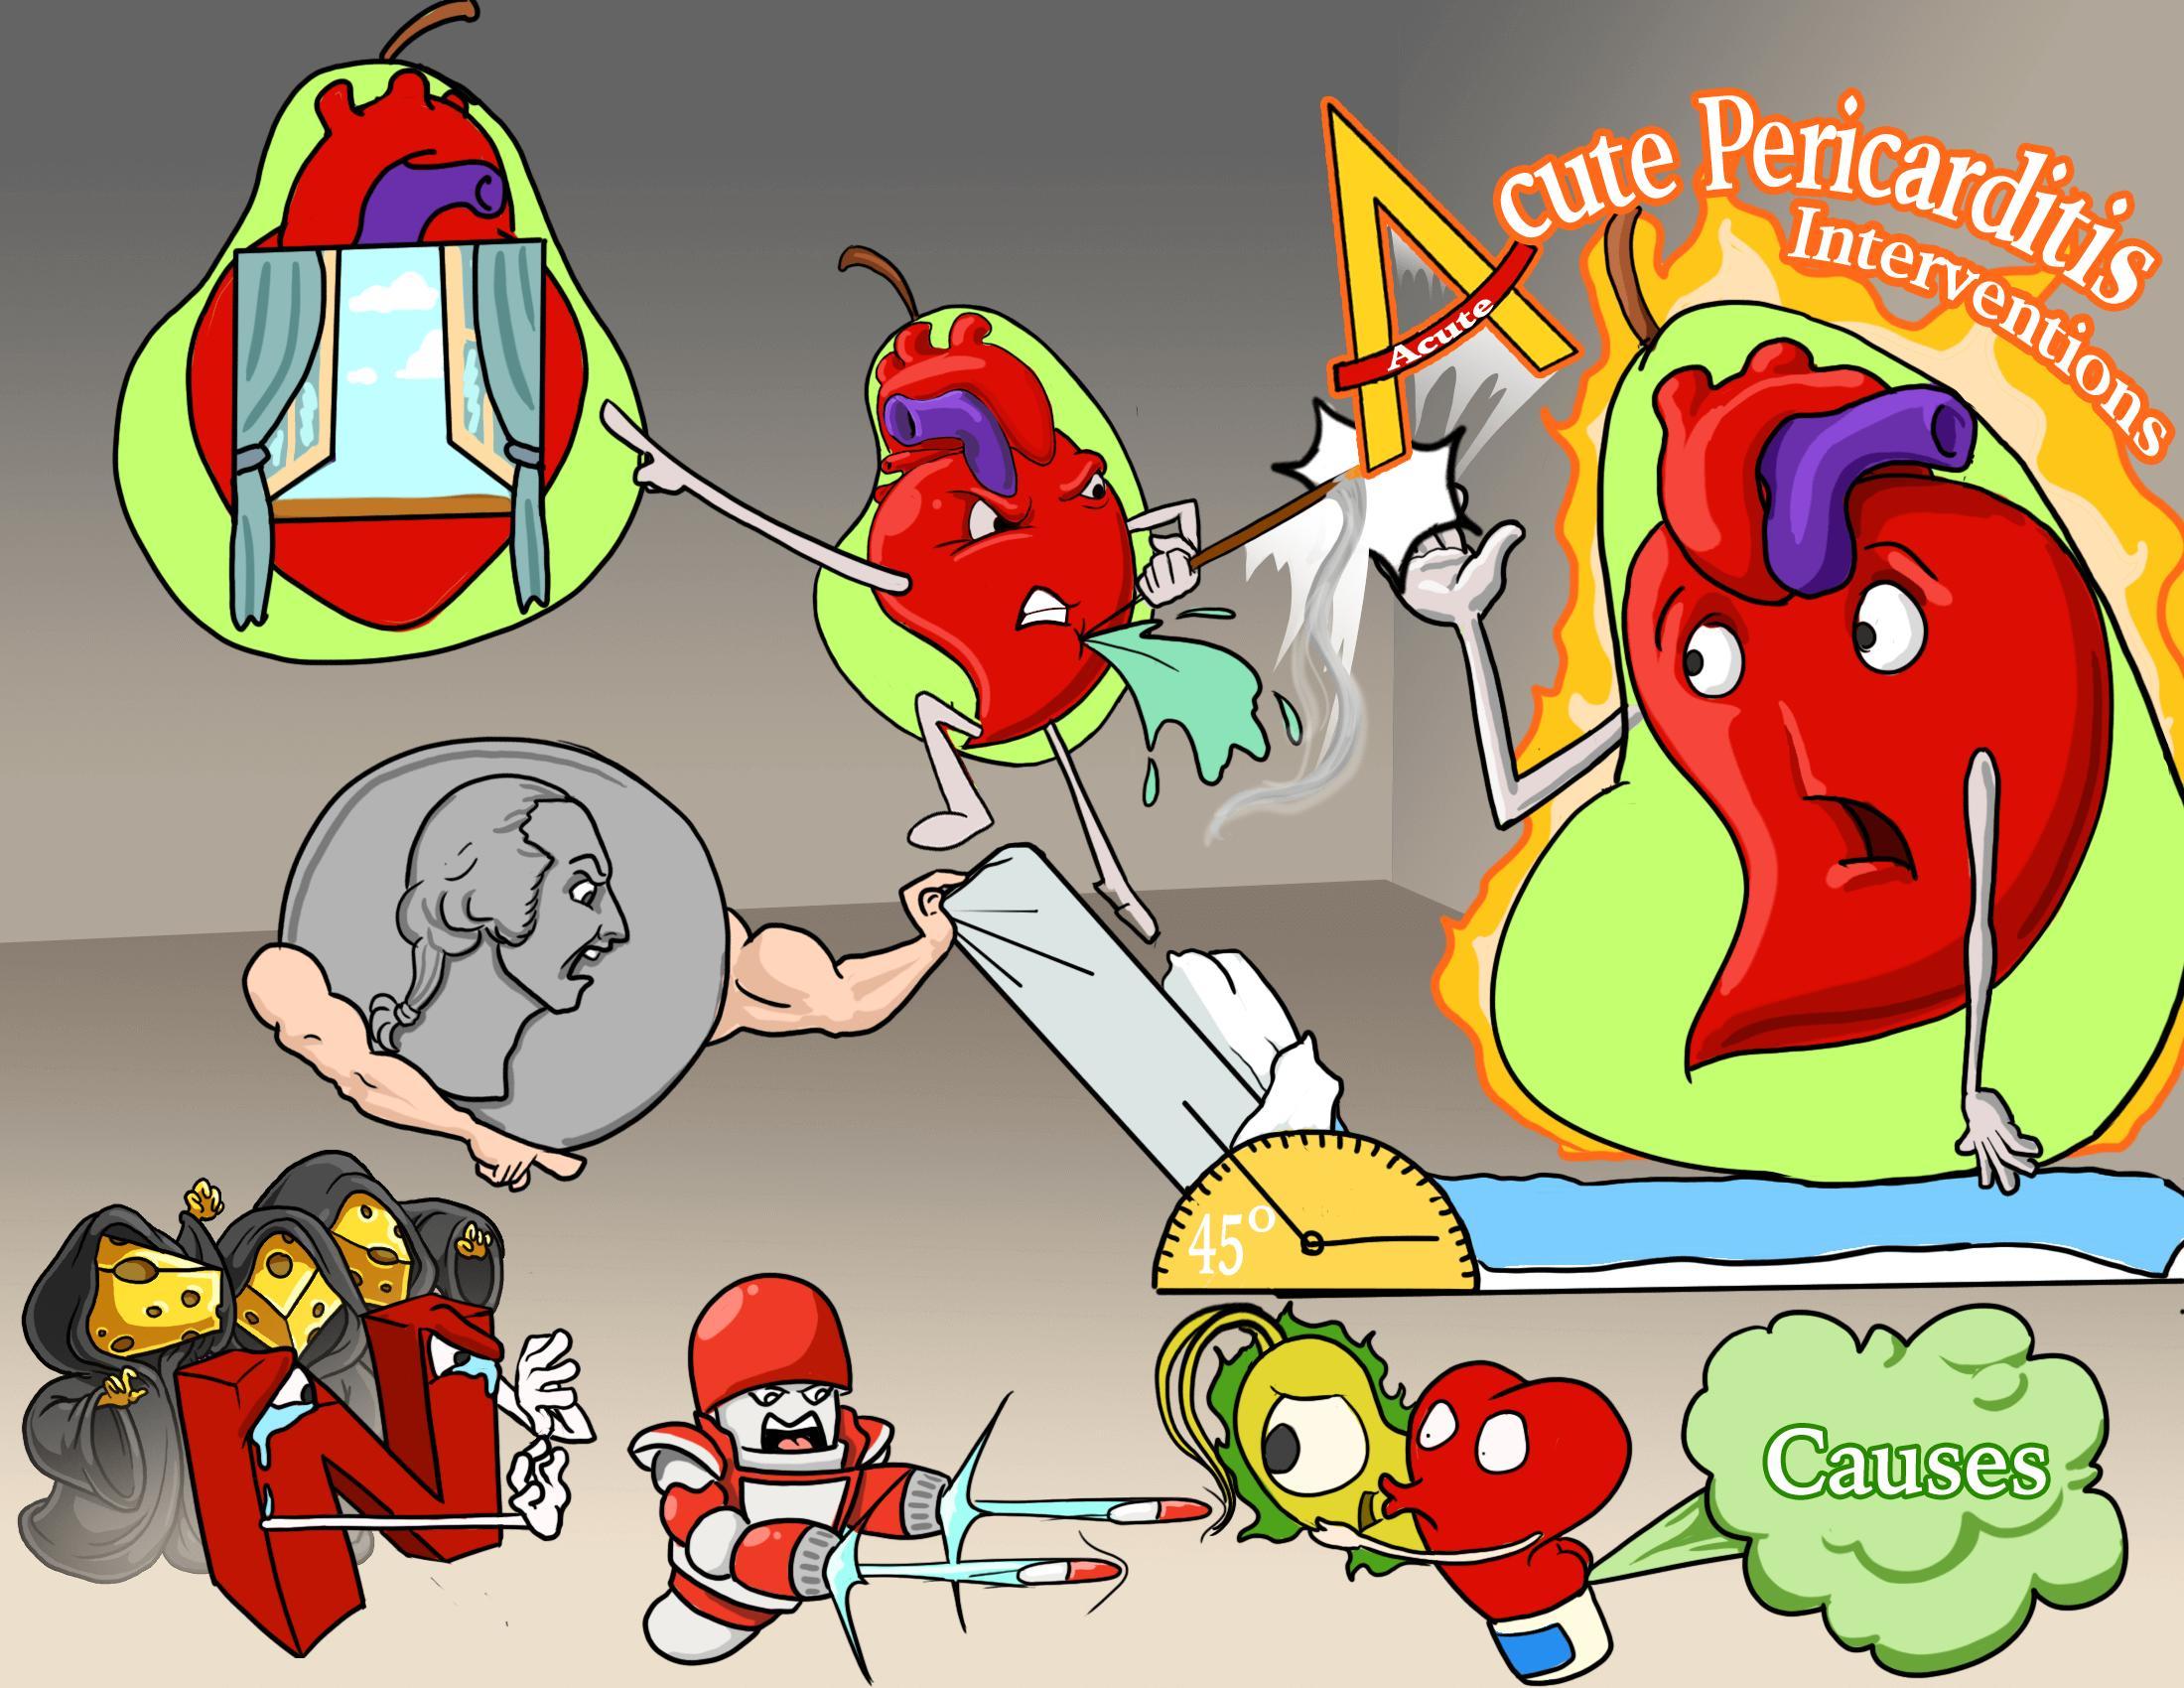 Acute Pericarditis Interventions